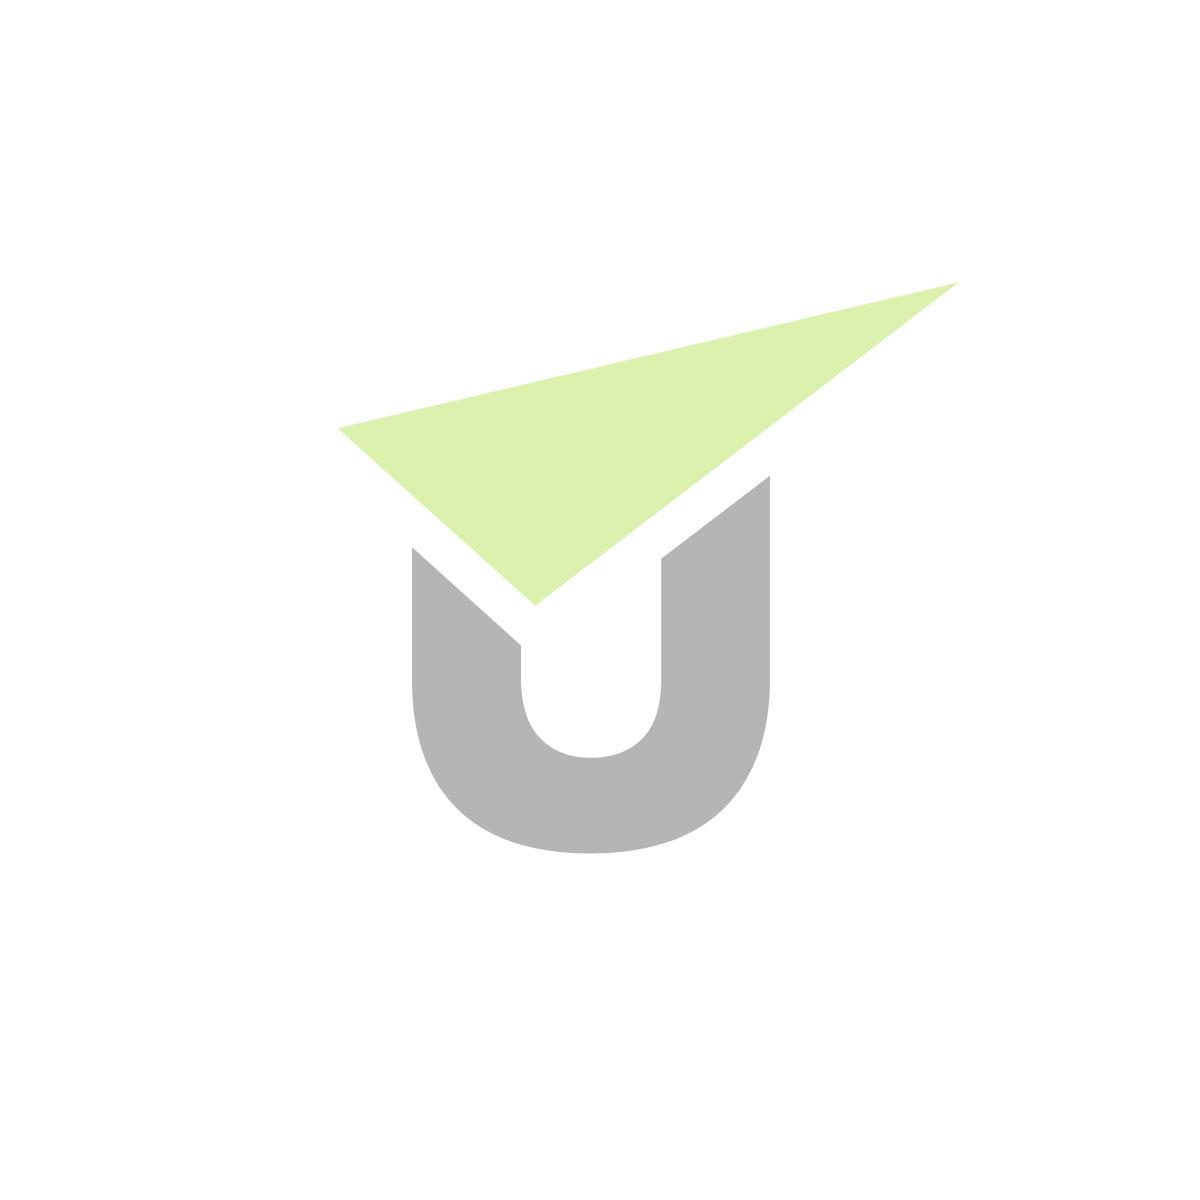 móvil infantil de cuna COSMO MOBILE de madera como producto recomendado